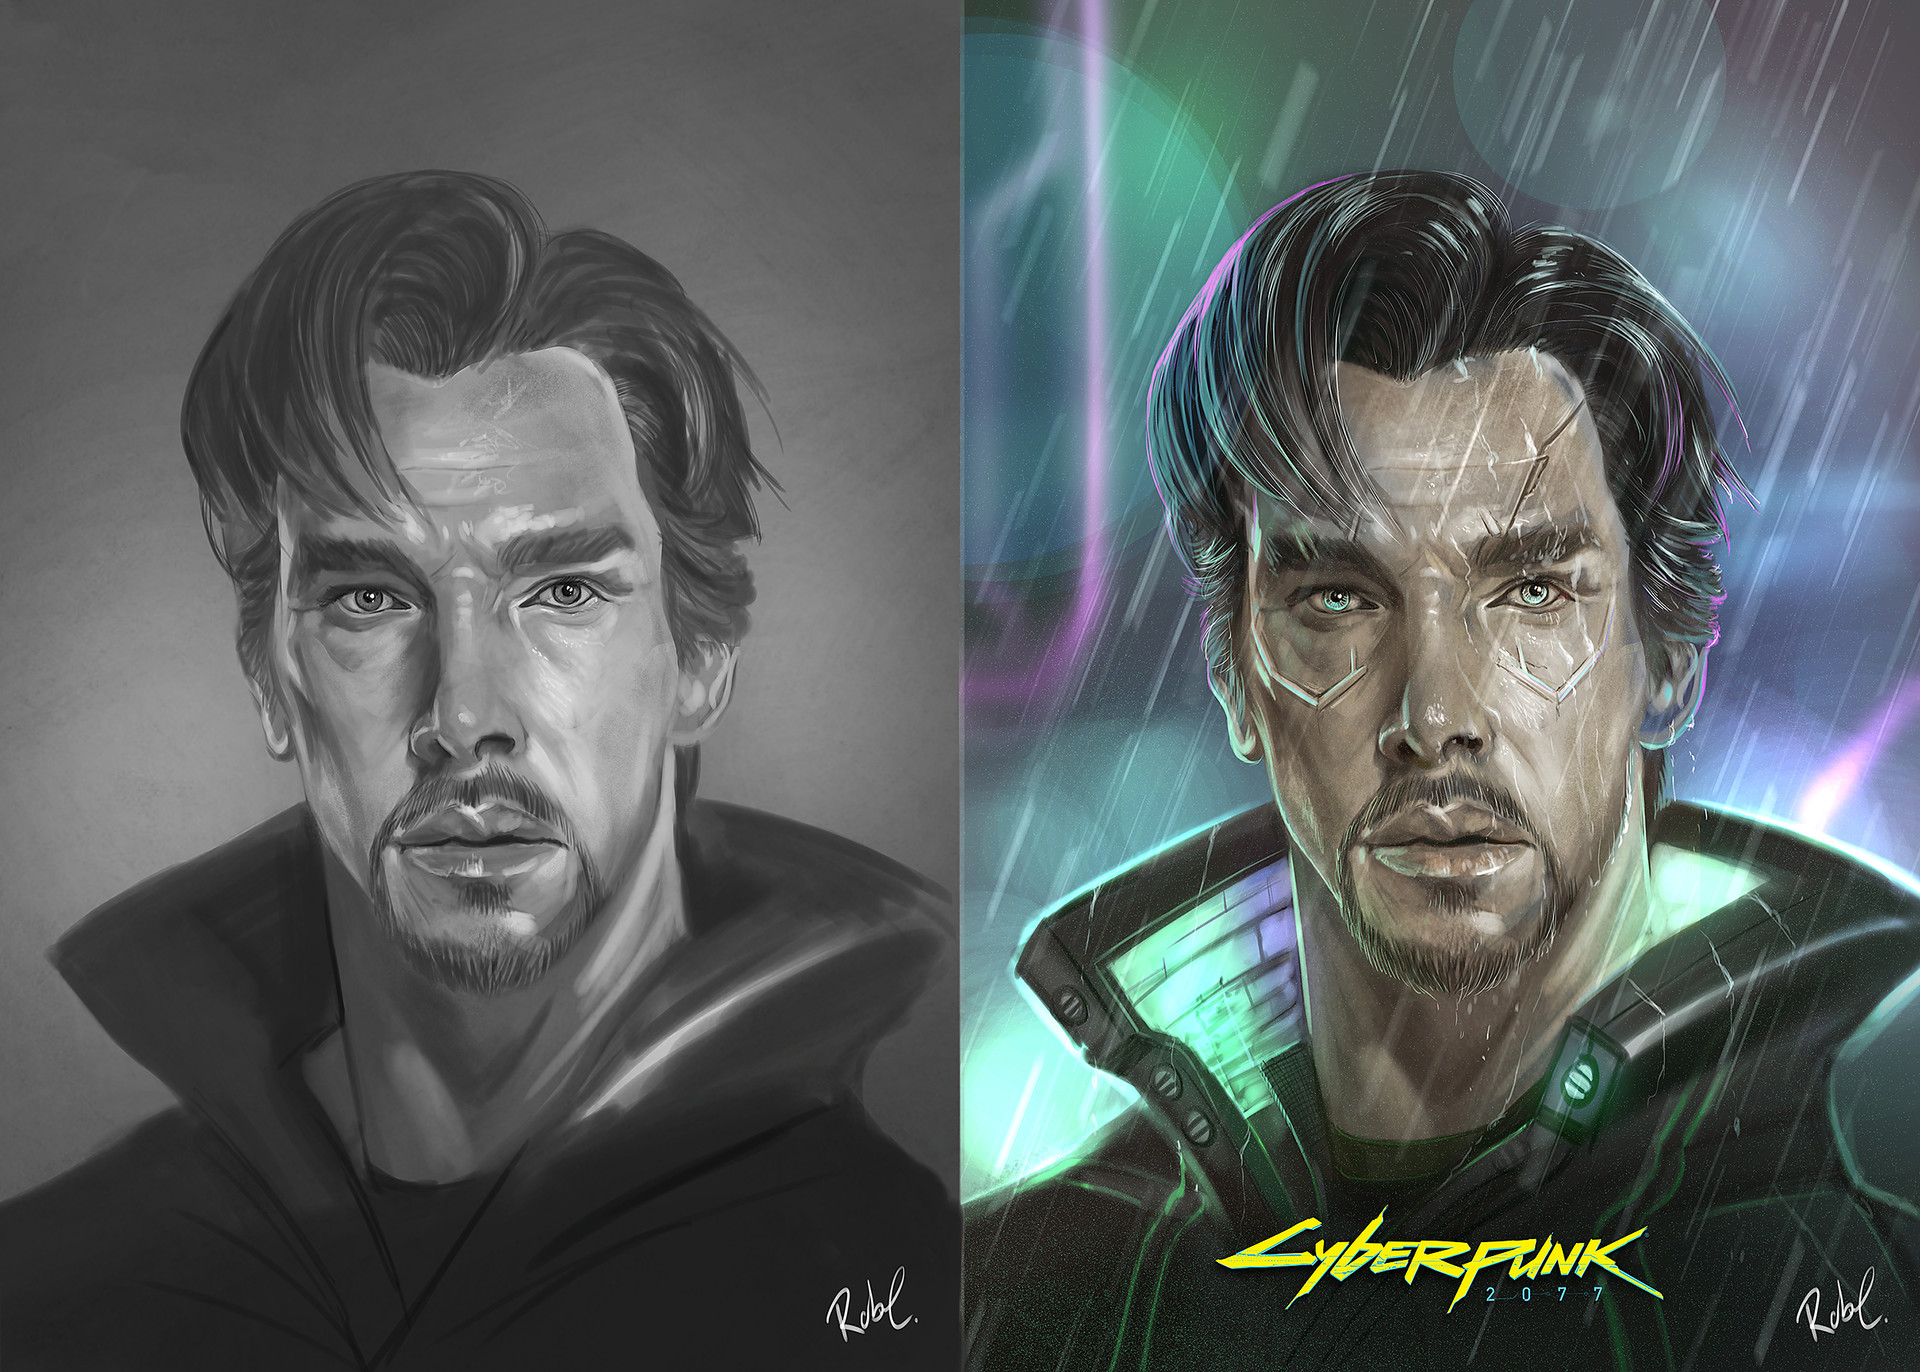 Robert crescenzio doctor strange cyberpunk 2077 fan art med res